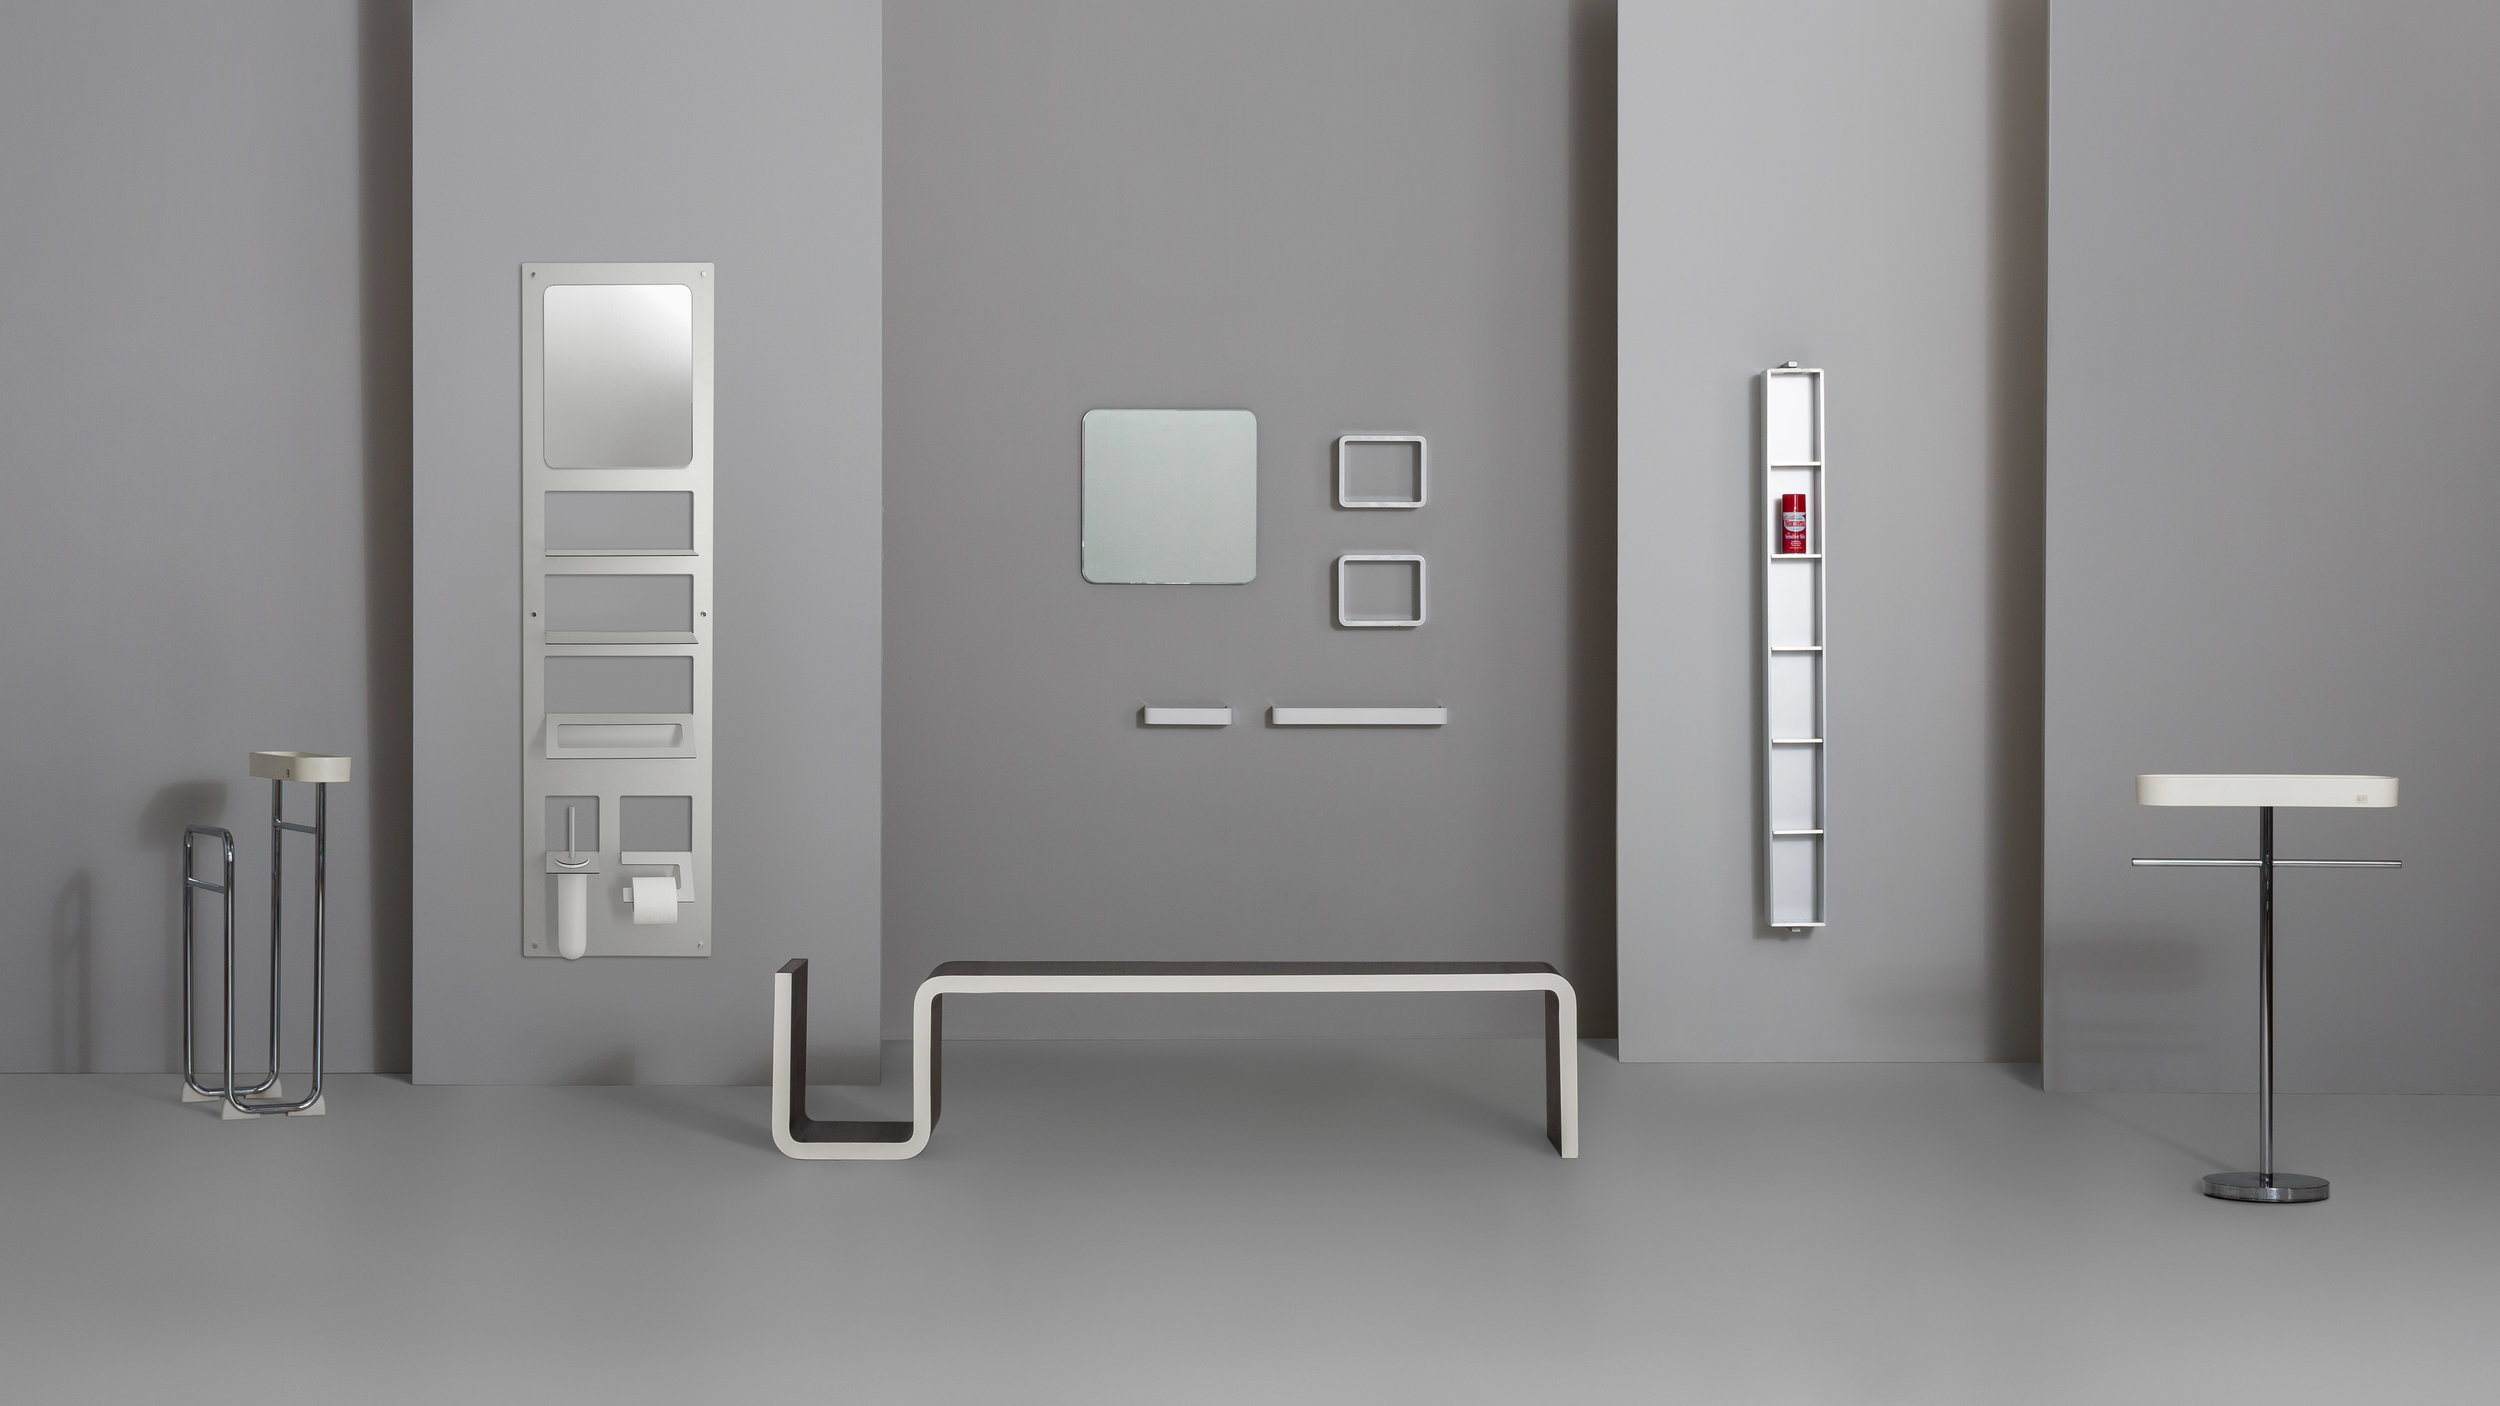 Theo-Williams-Product-Industrial-Design-Furniture-Bathroom.jpg